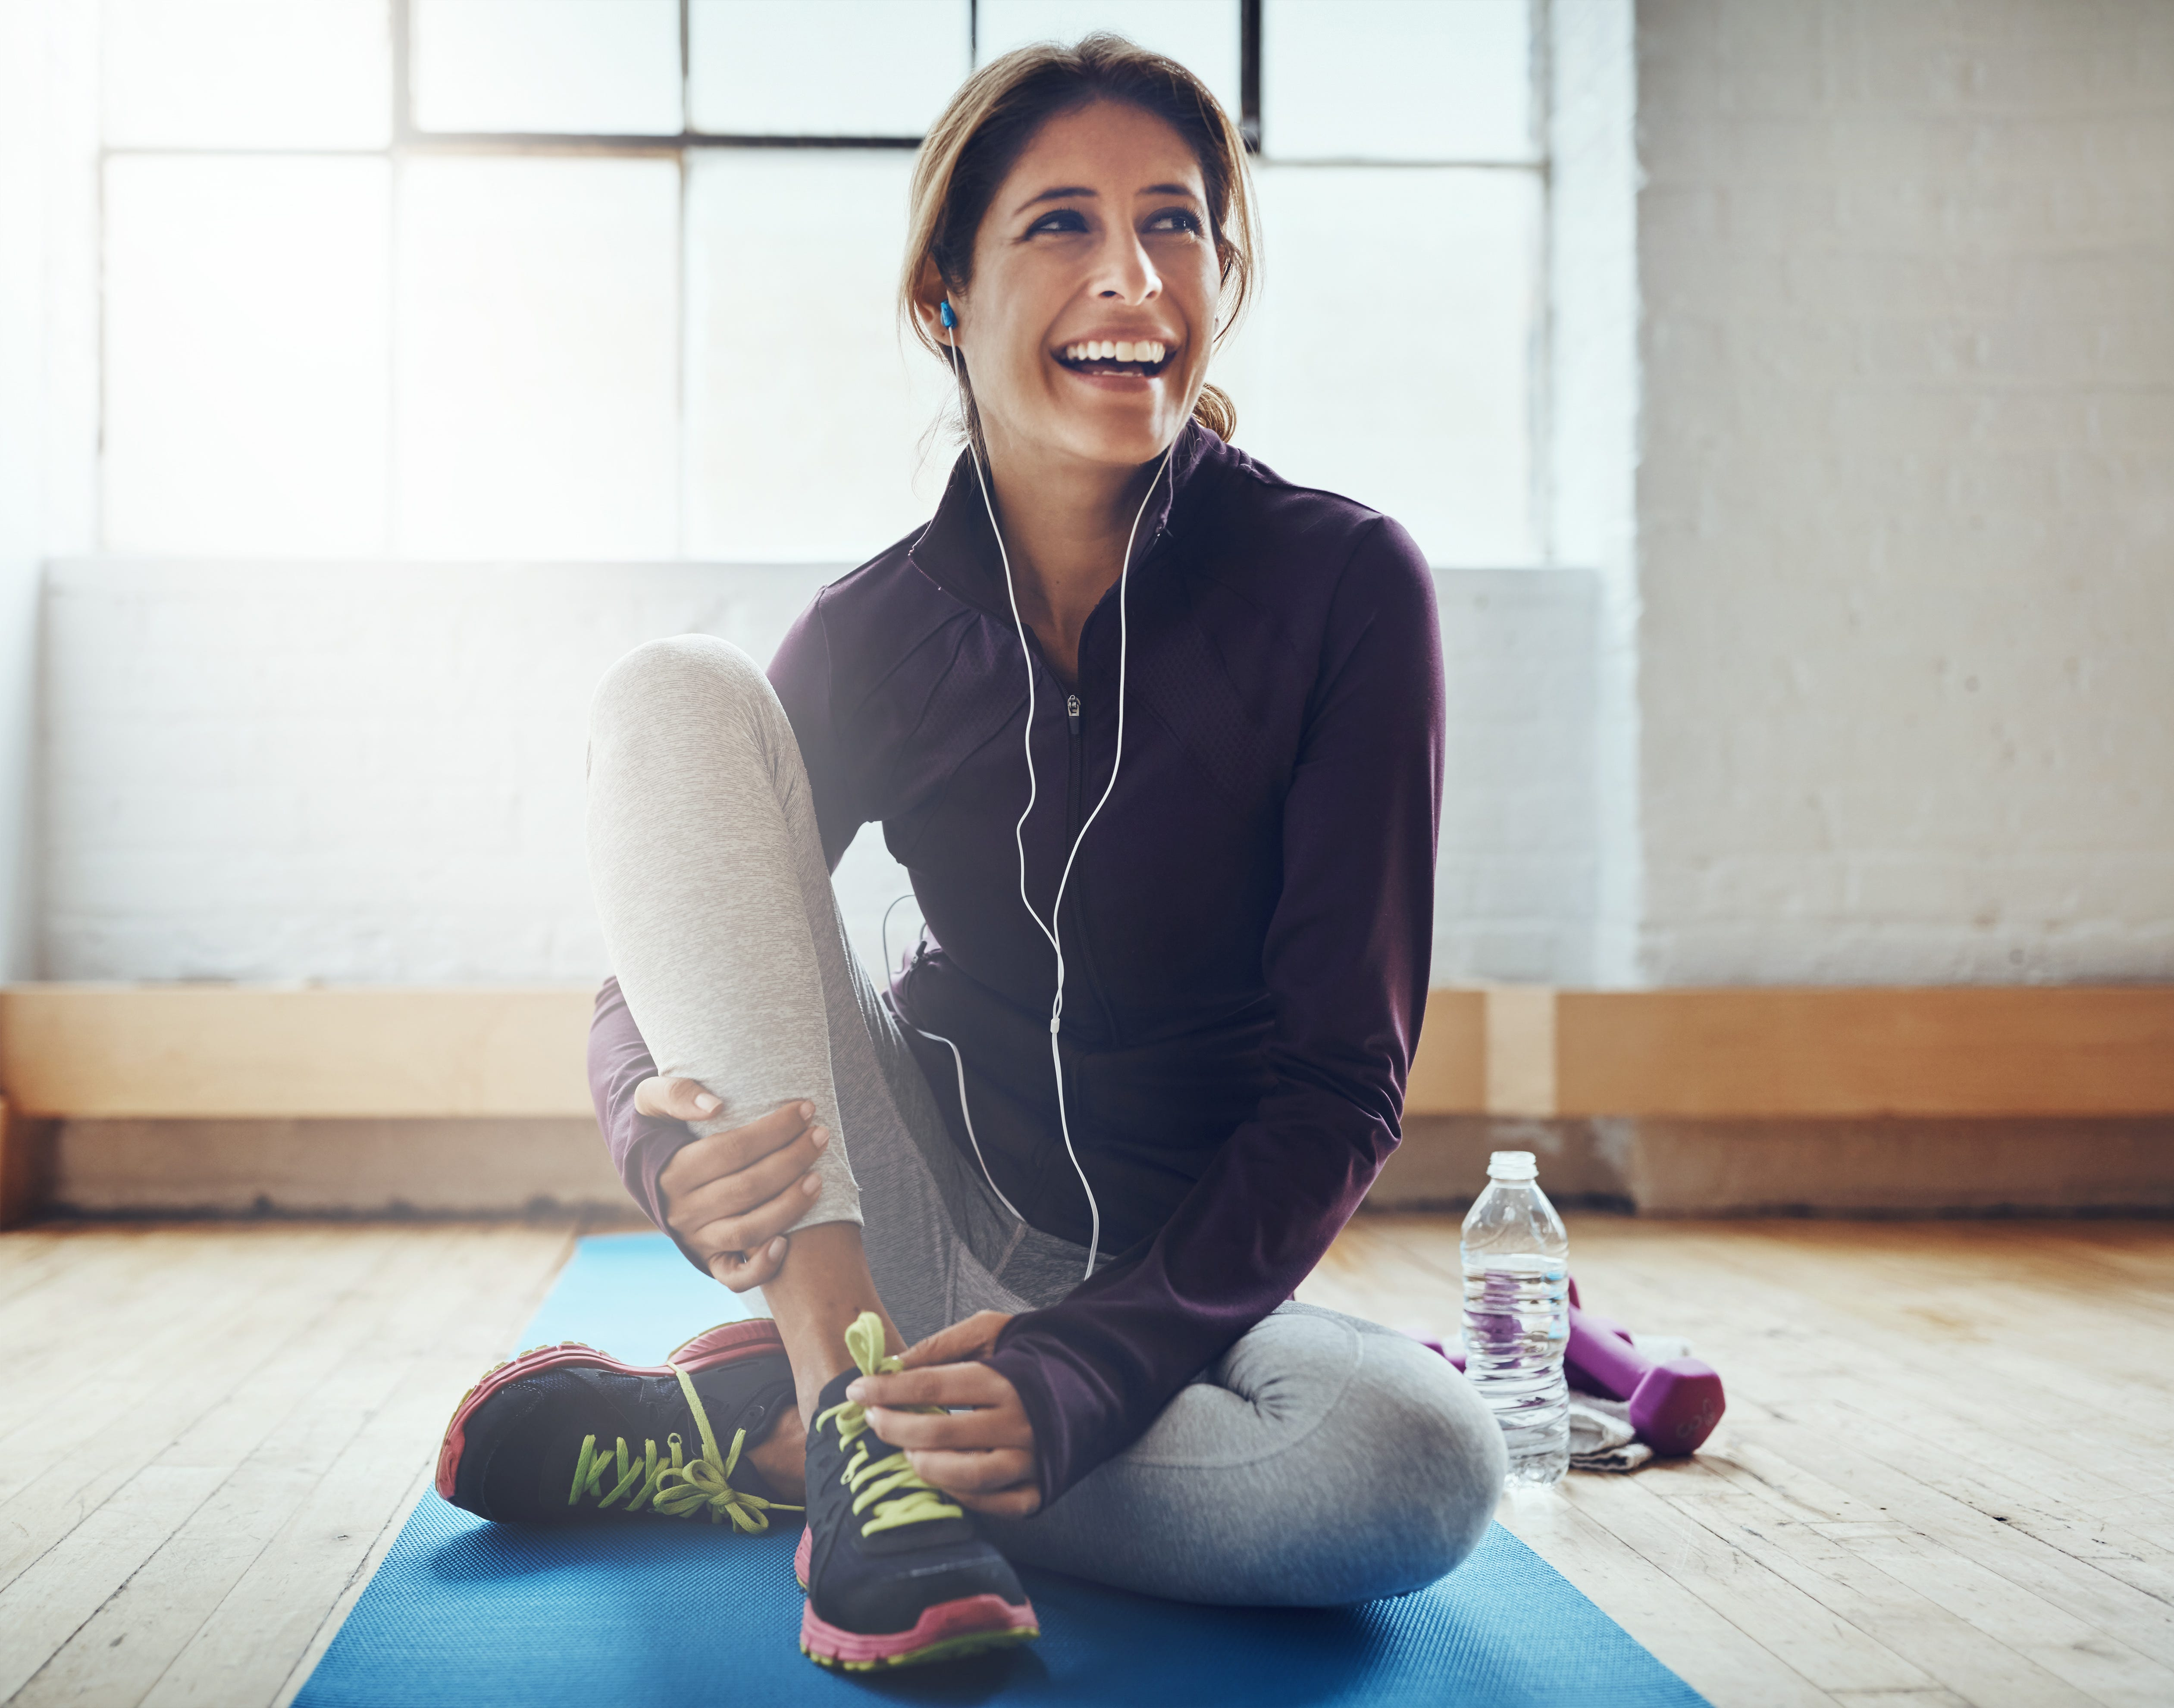 Alexa Rydell Yoga Girl Meditating Porn https://wwwatoday/story/news/2018/09/30/california